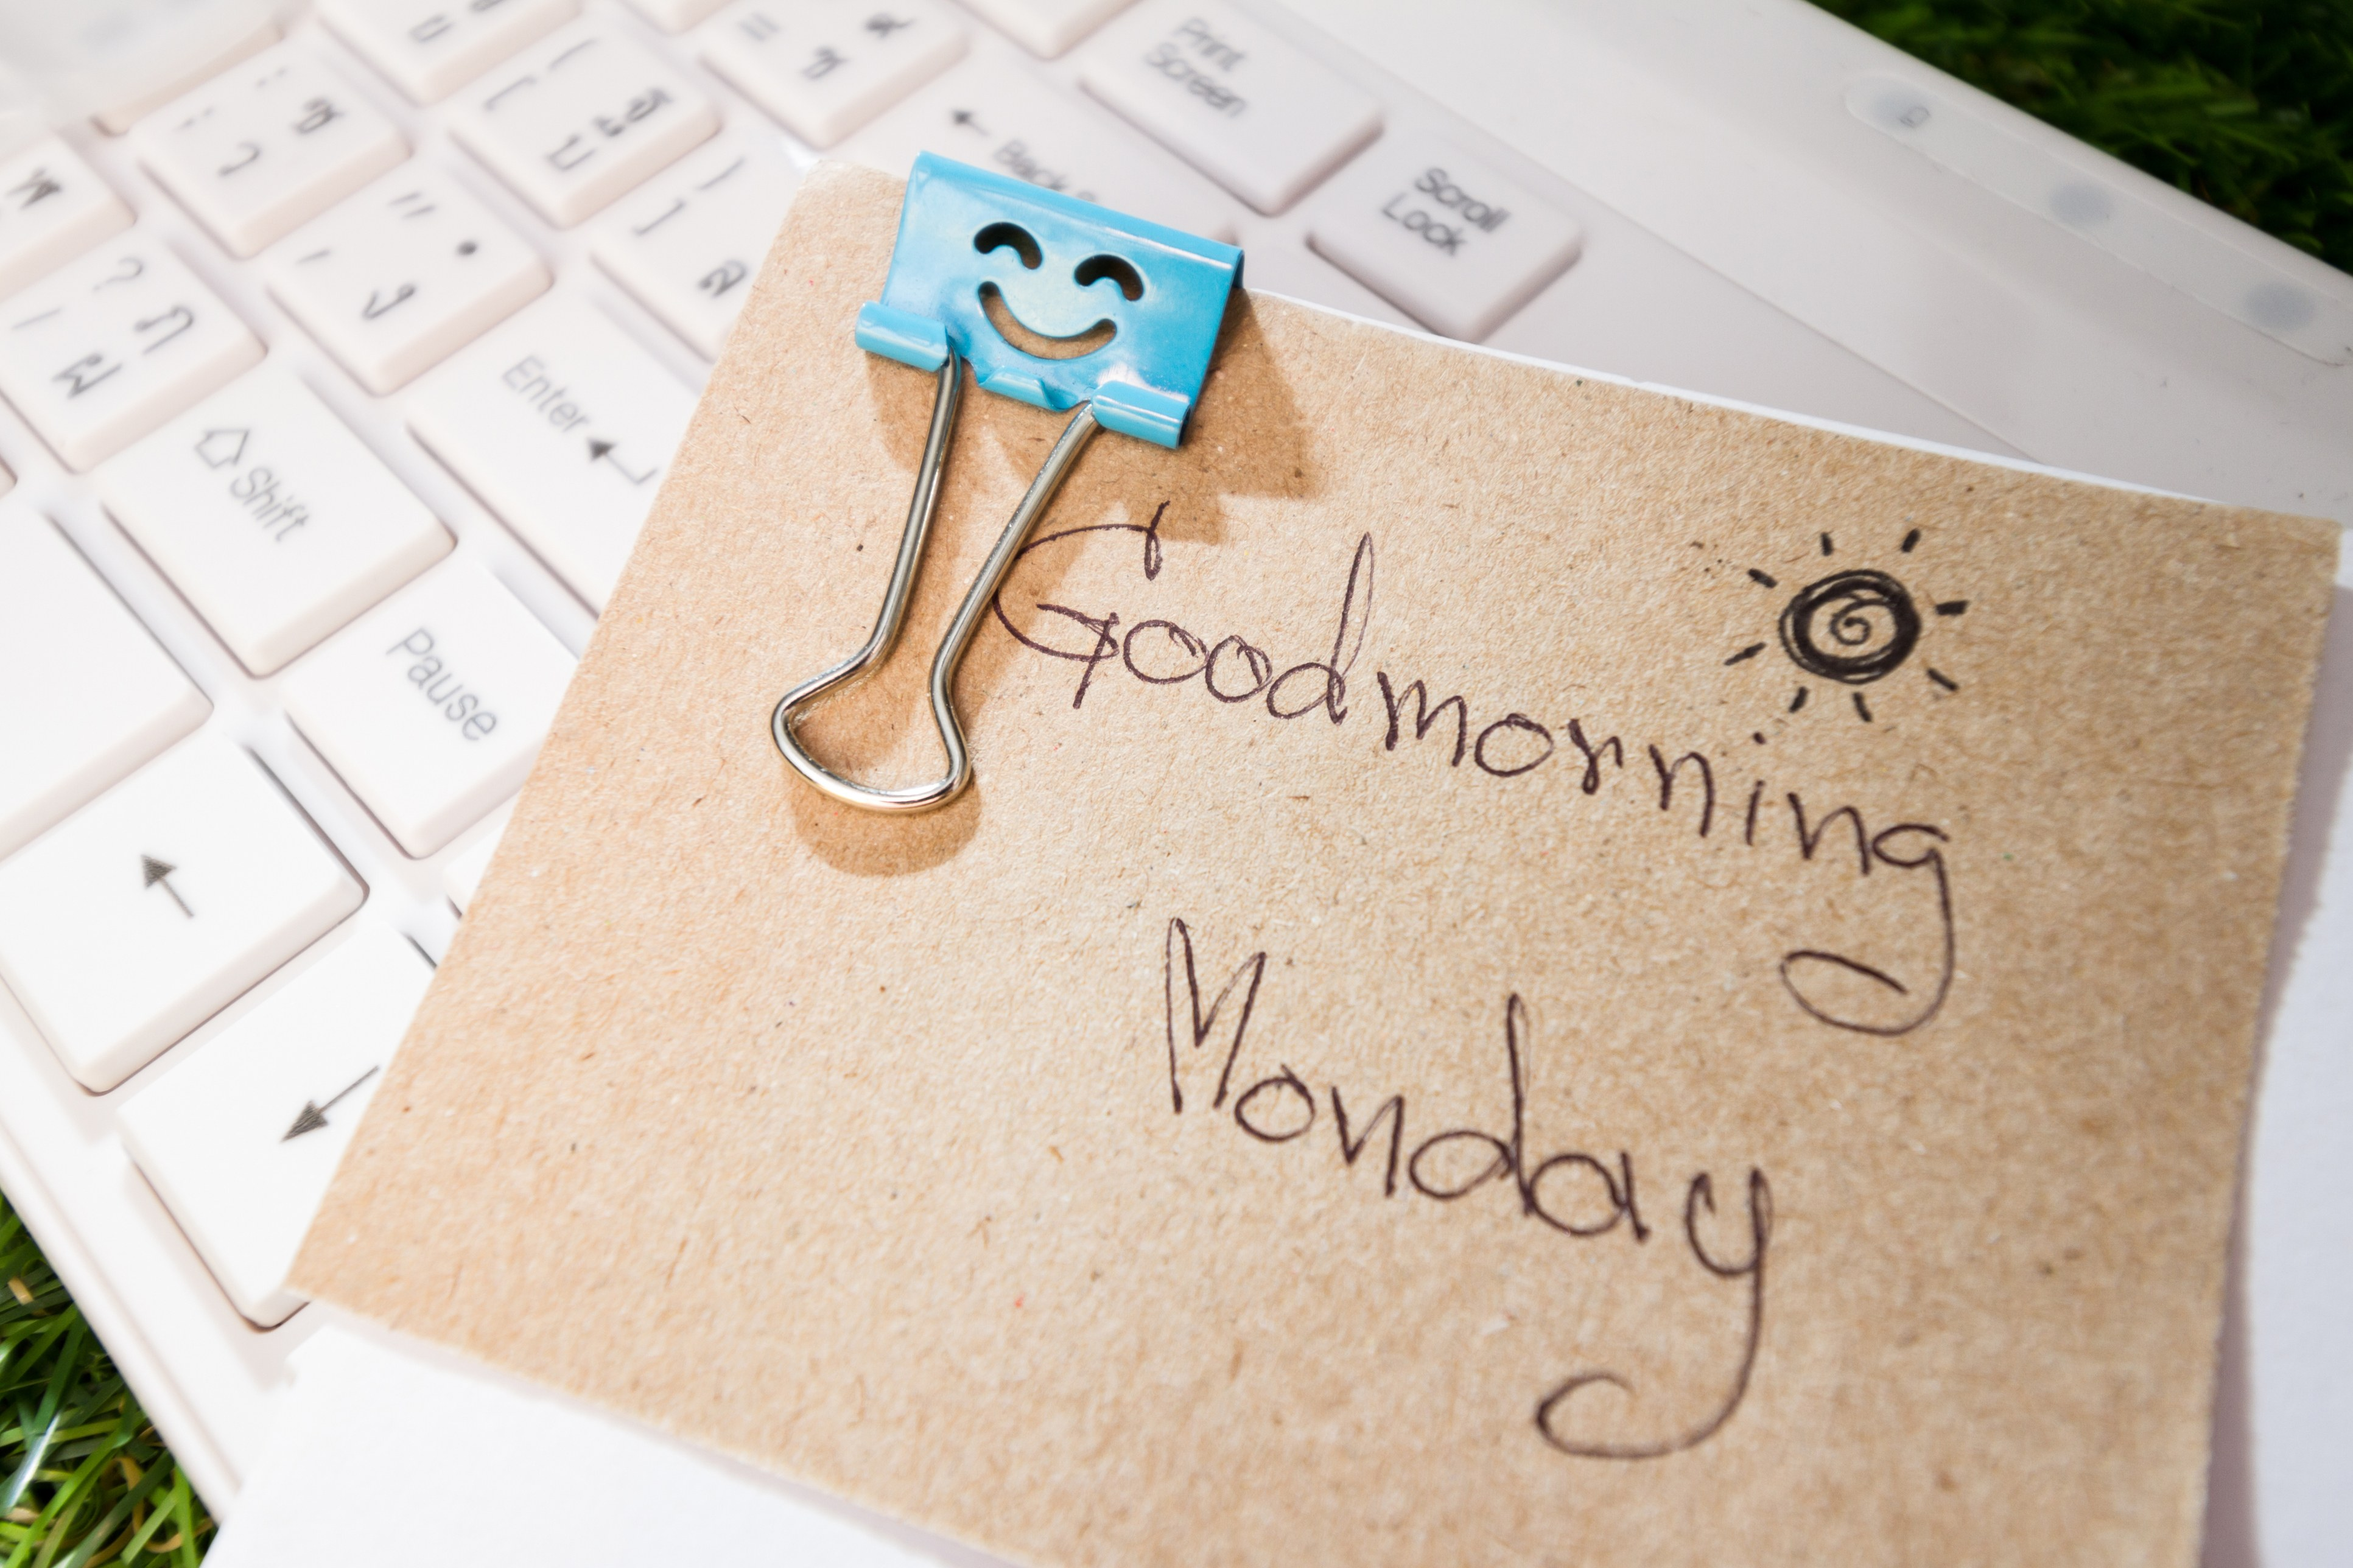 post-it note saying good morning monday